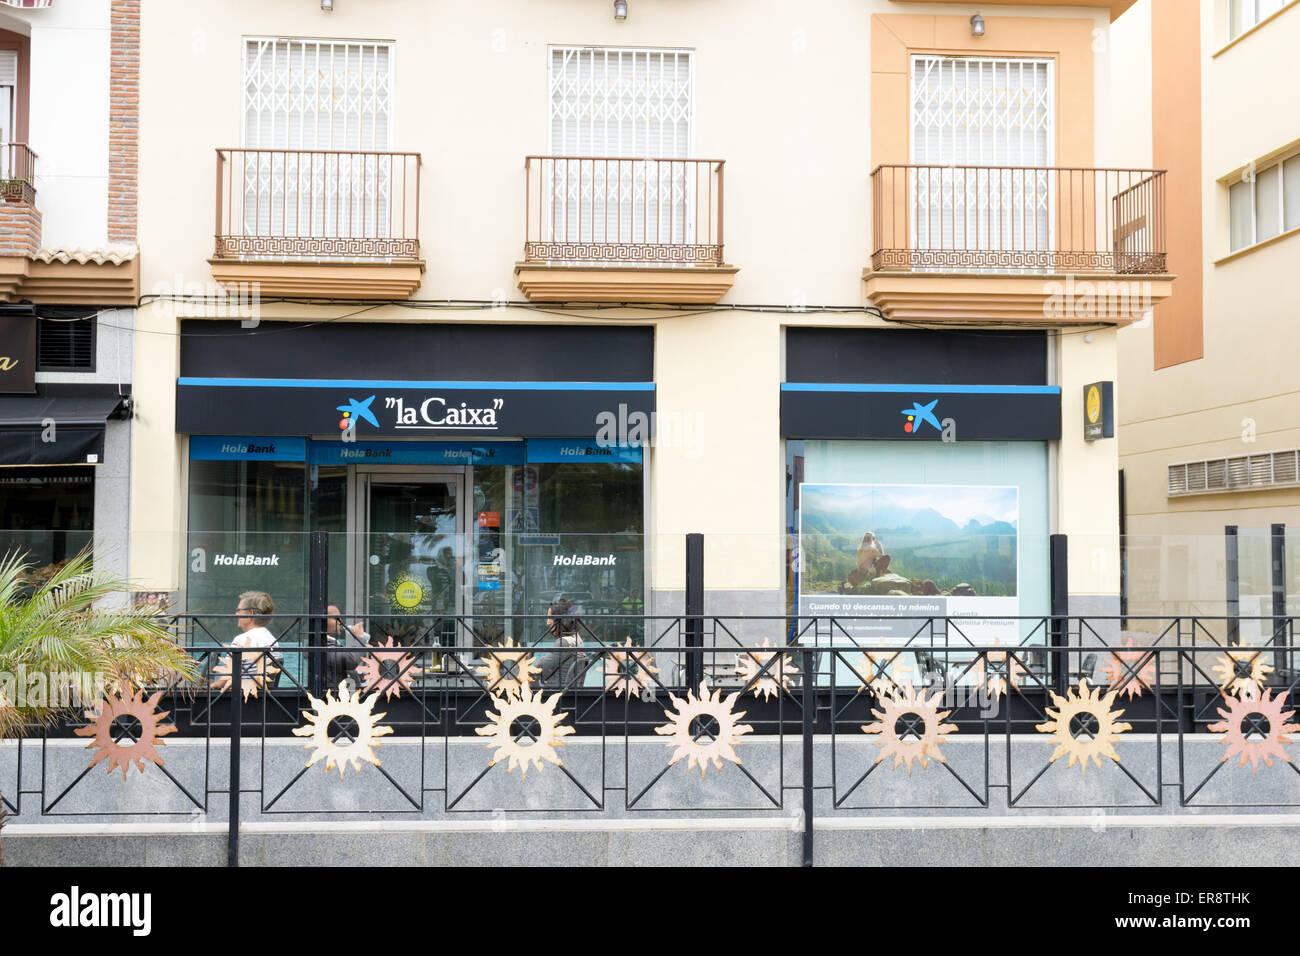 branch of La Caixa bank in Fuengirola, Malaga, Spain. - Stock Image